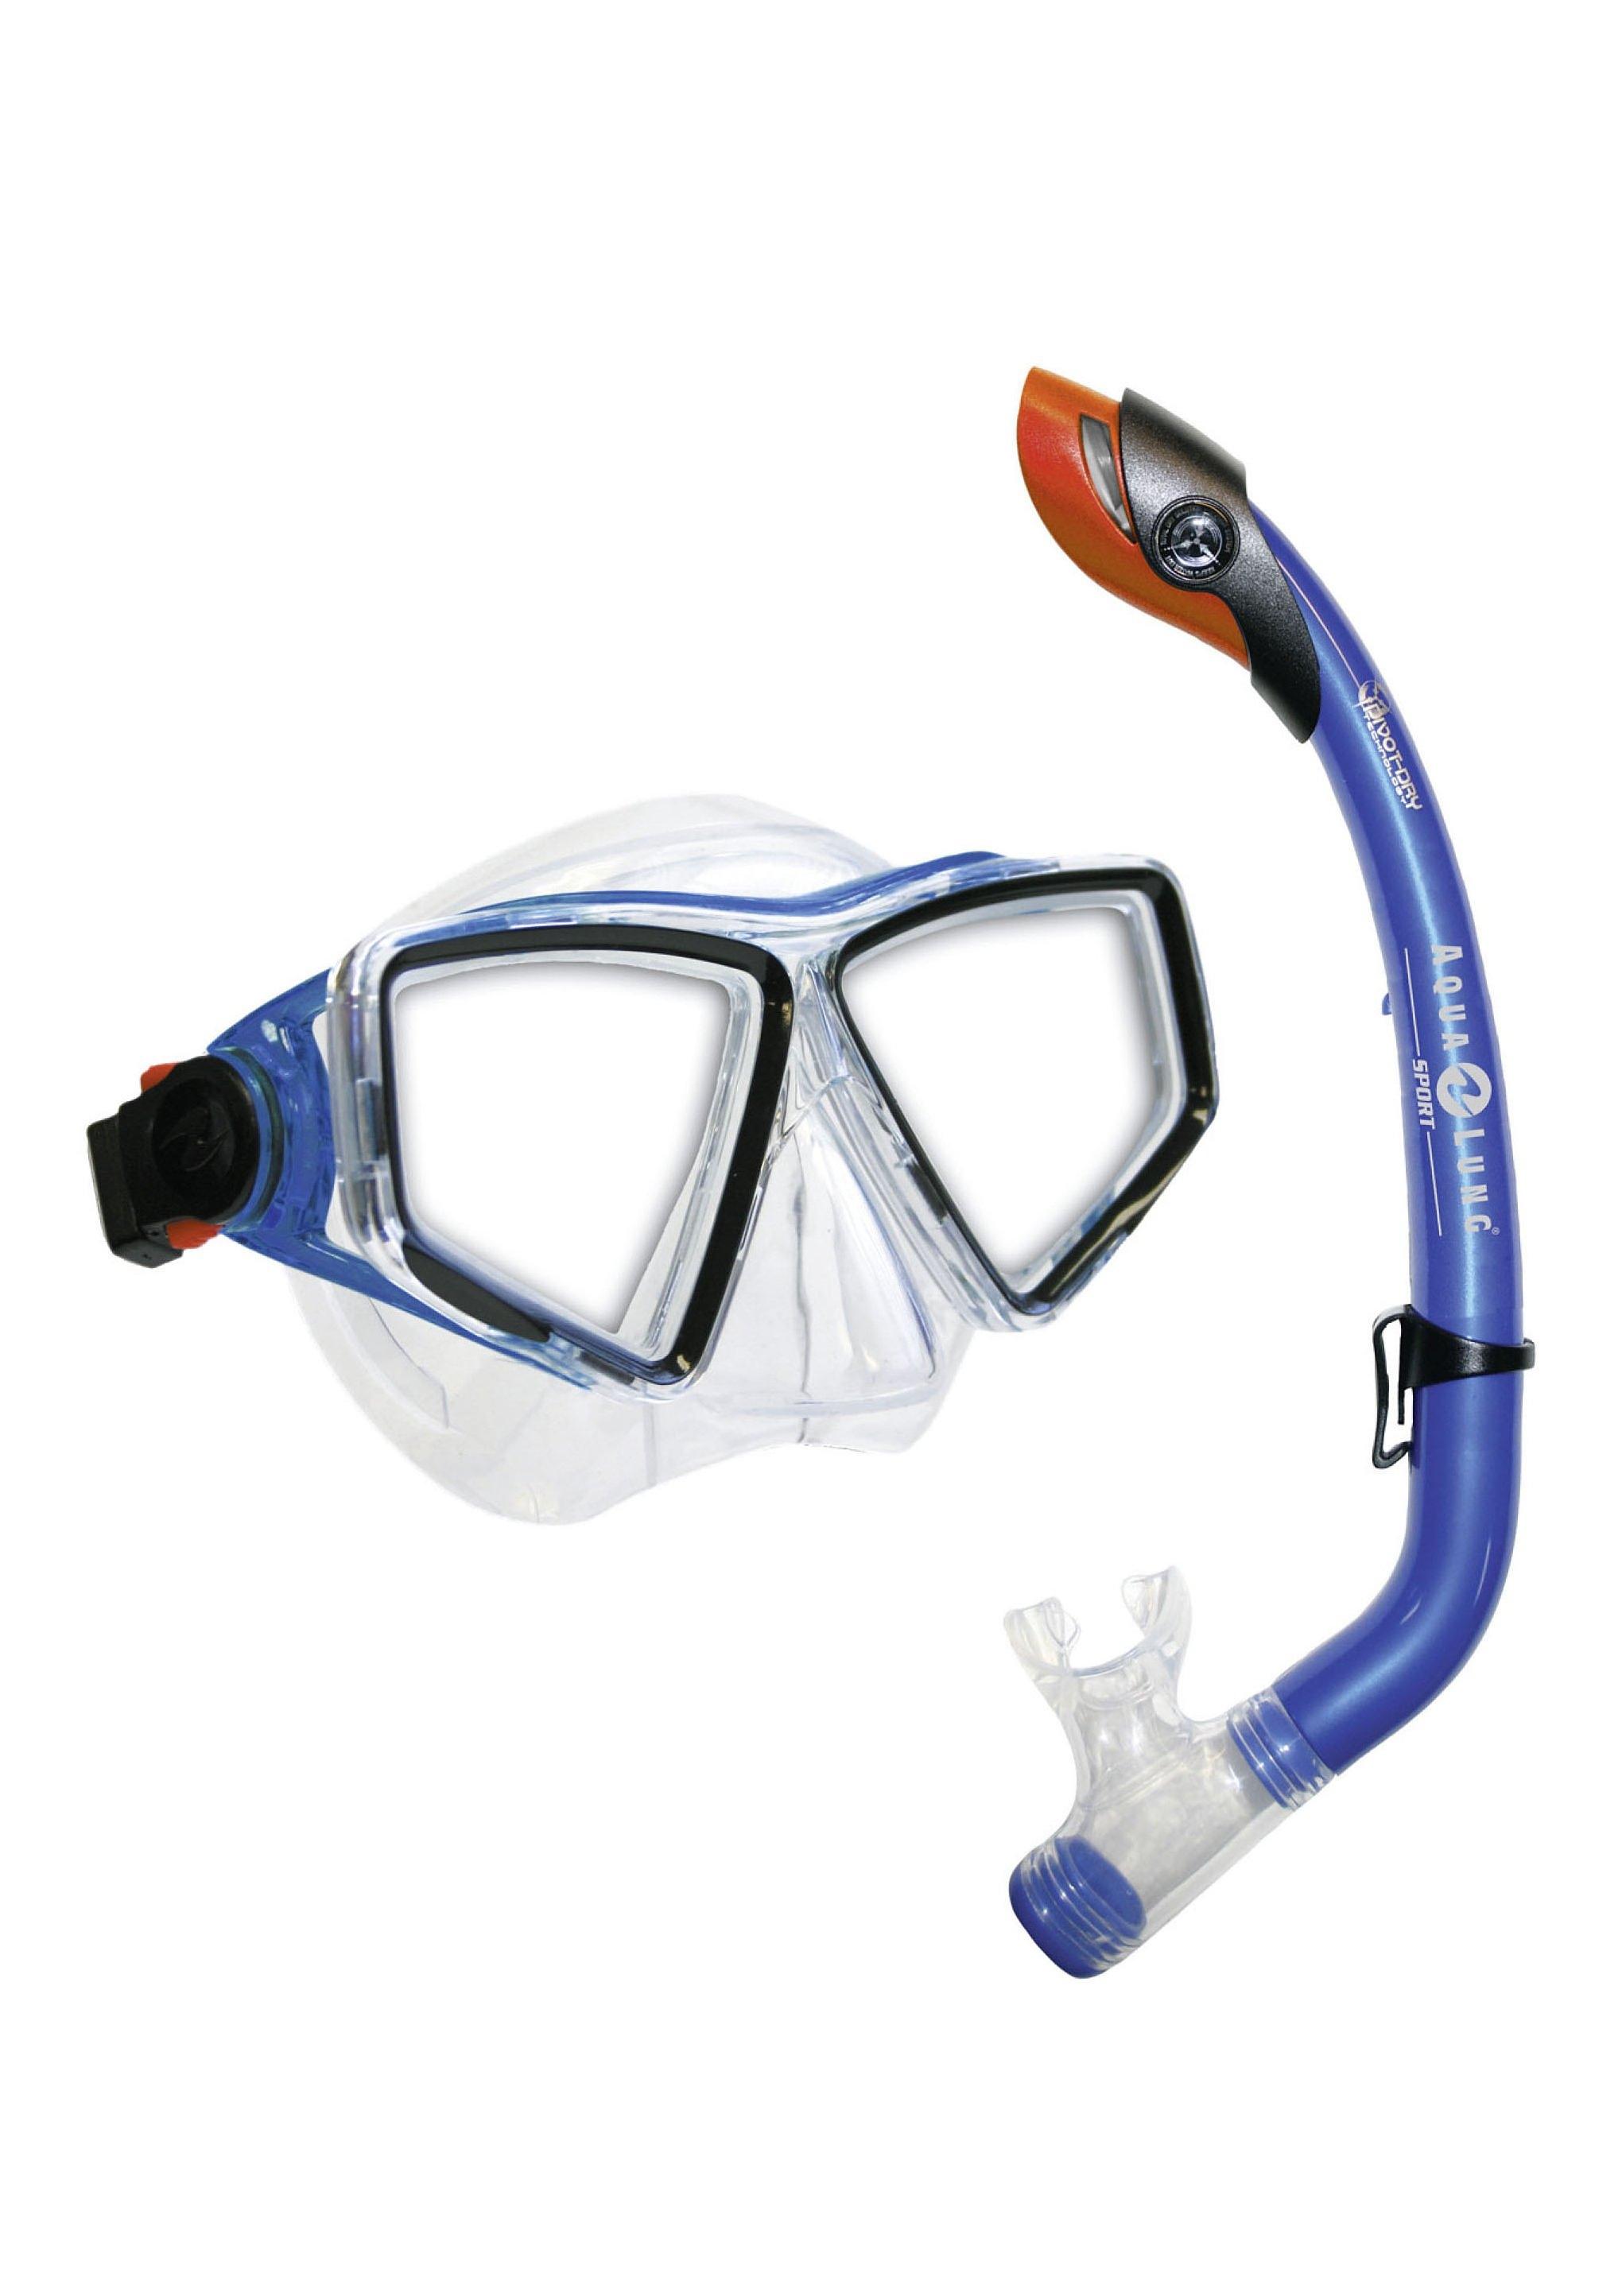 Aqua Lung Sport Duikmasker + snorkel, 'LANAI LX/PARADISE PRO JR.', 2-delige set goedkoop op otto.nl kopen